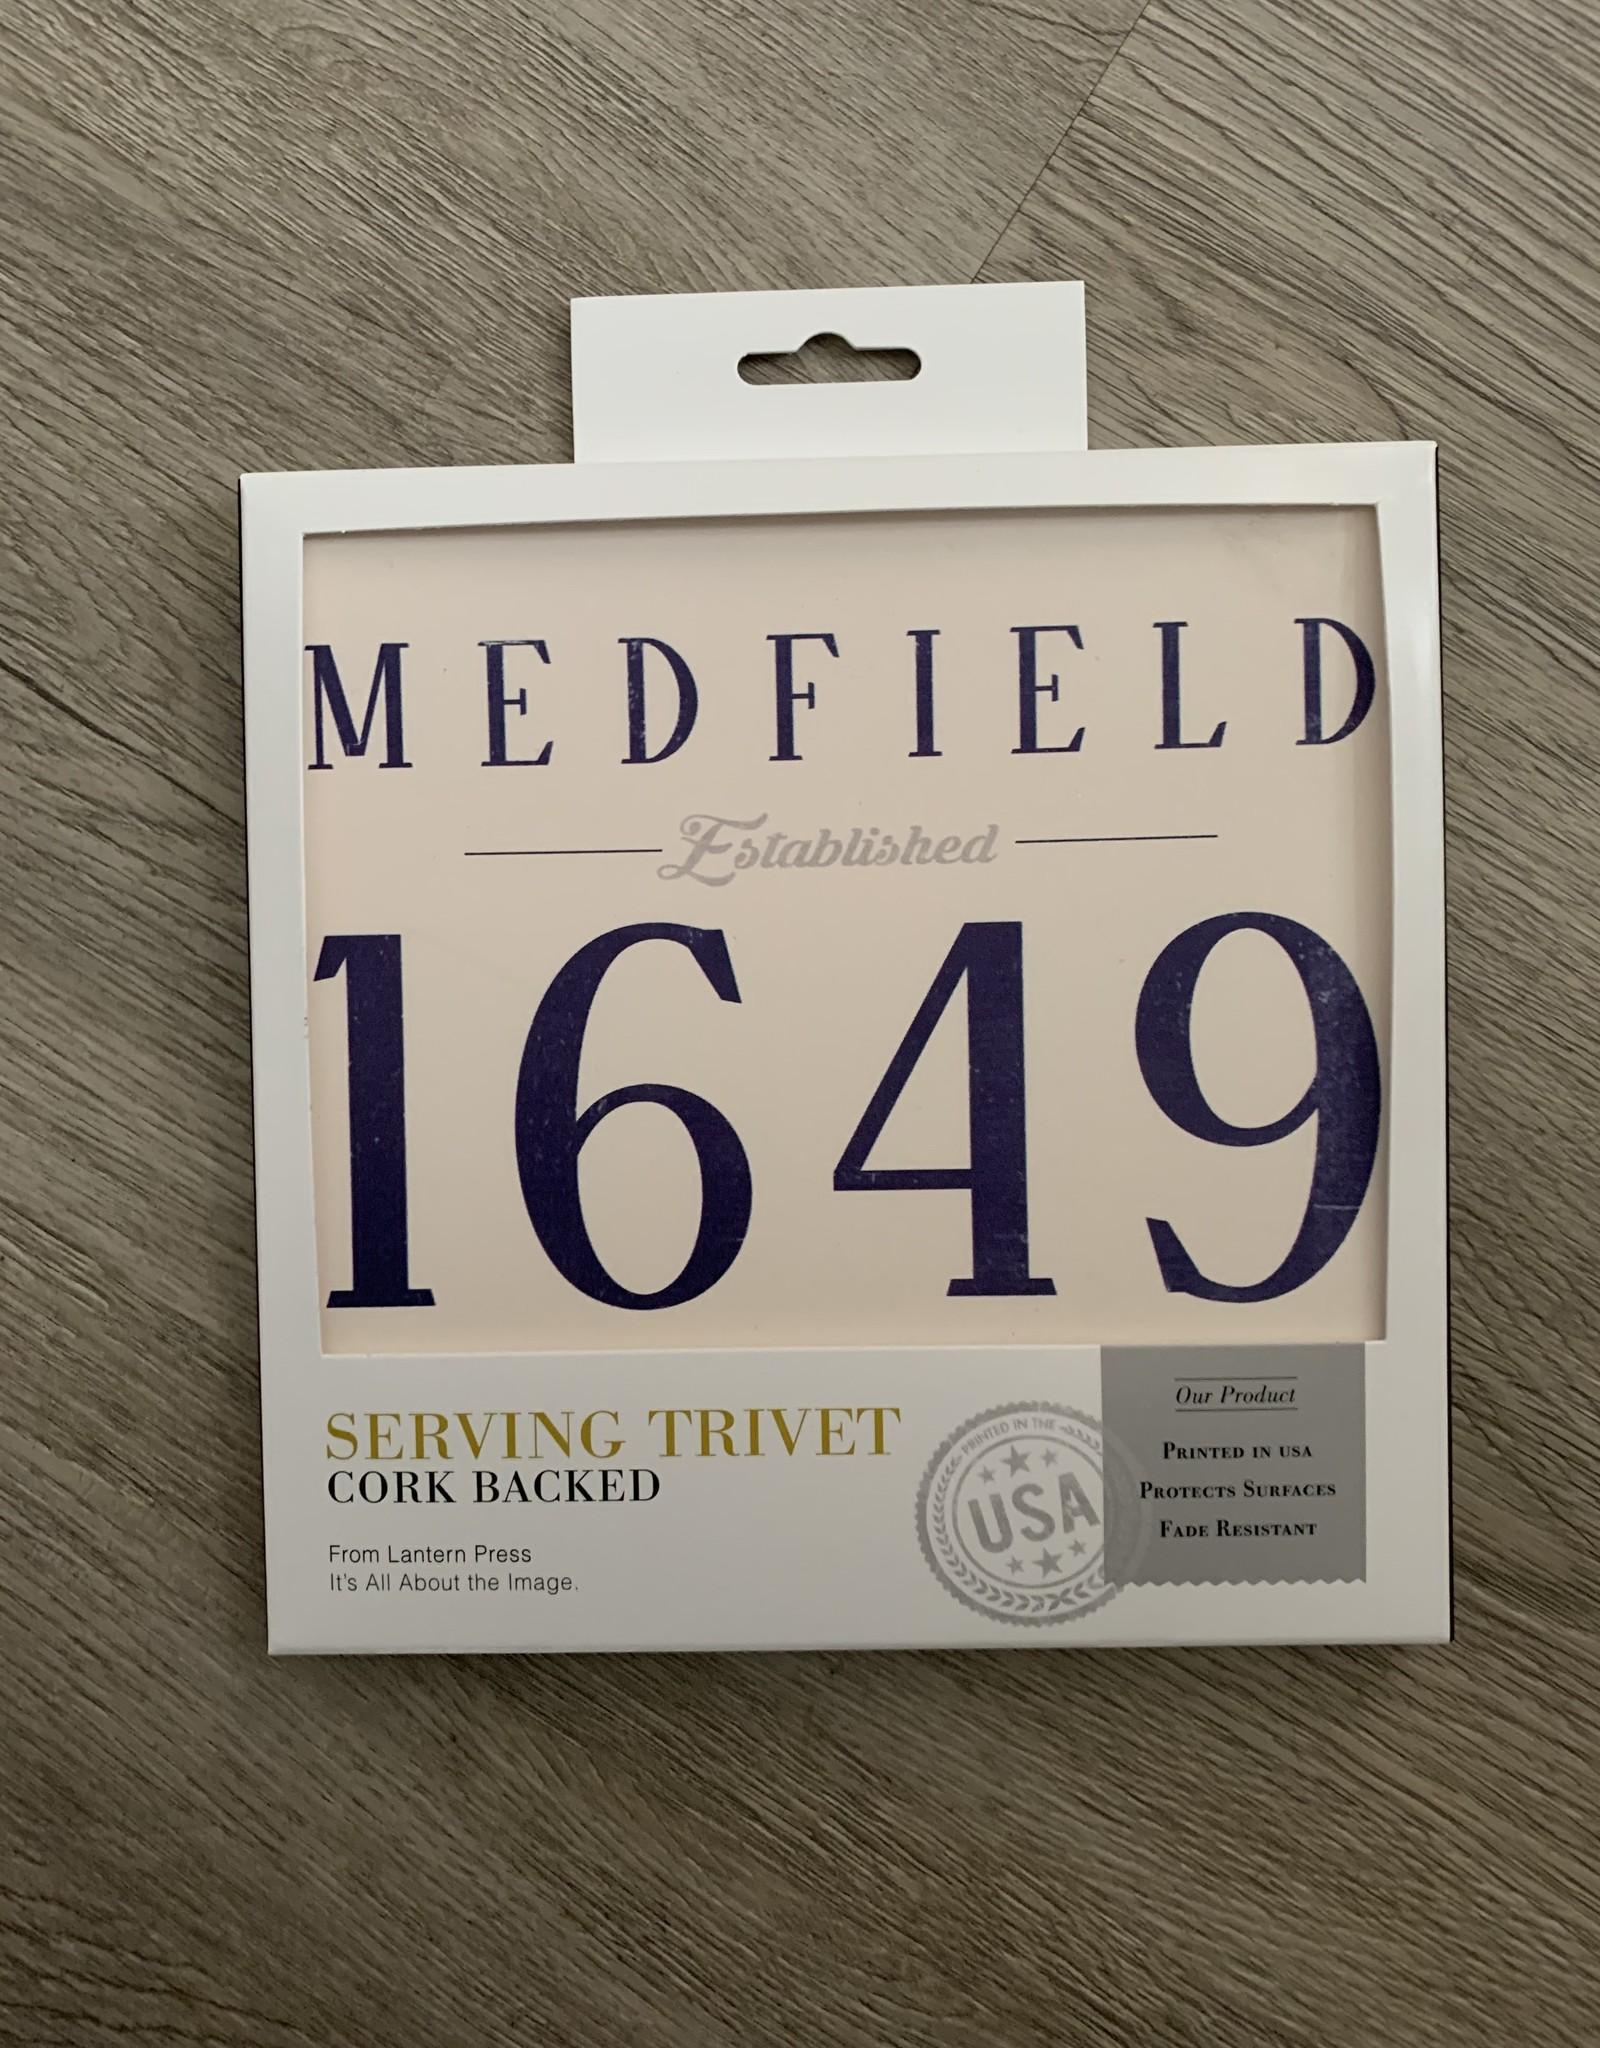 Lantern Press - Medfield EST 1649 Trivet